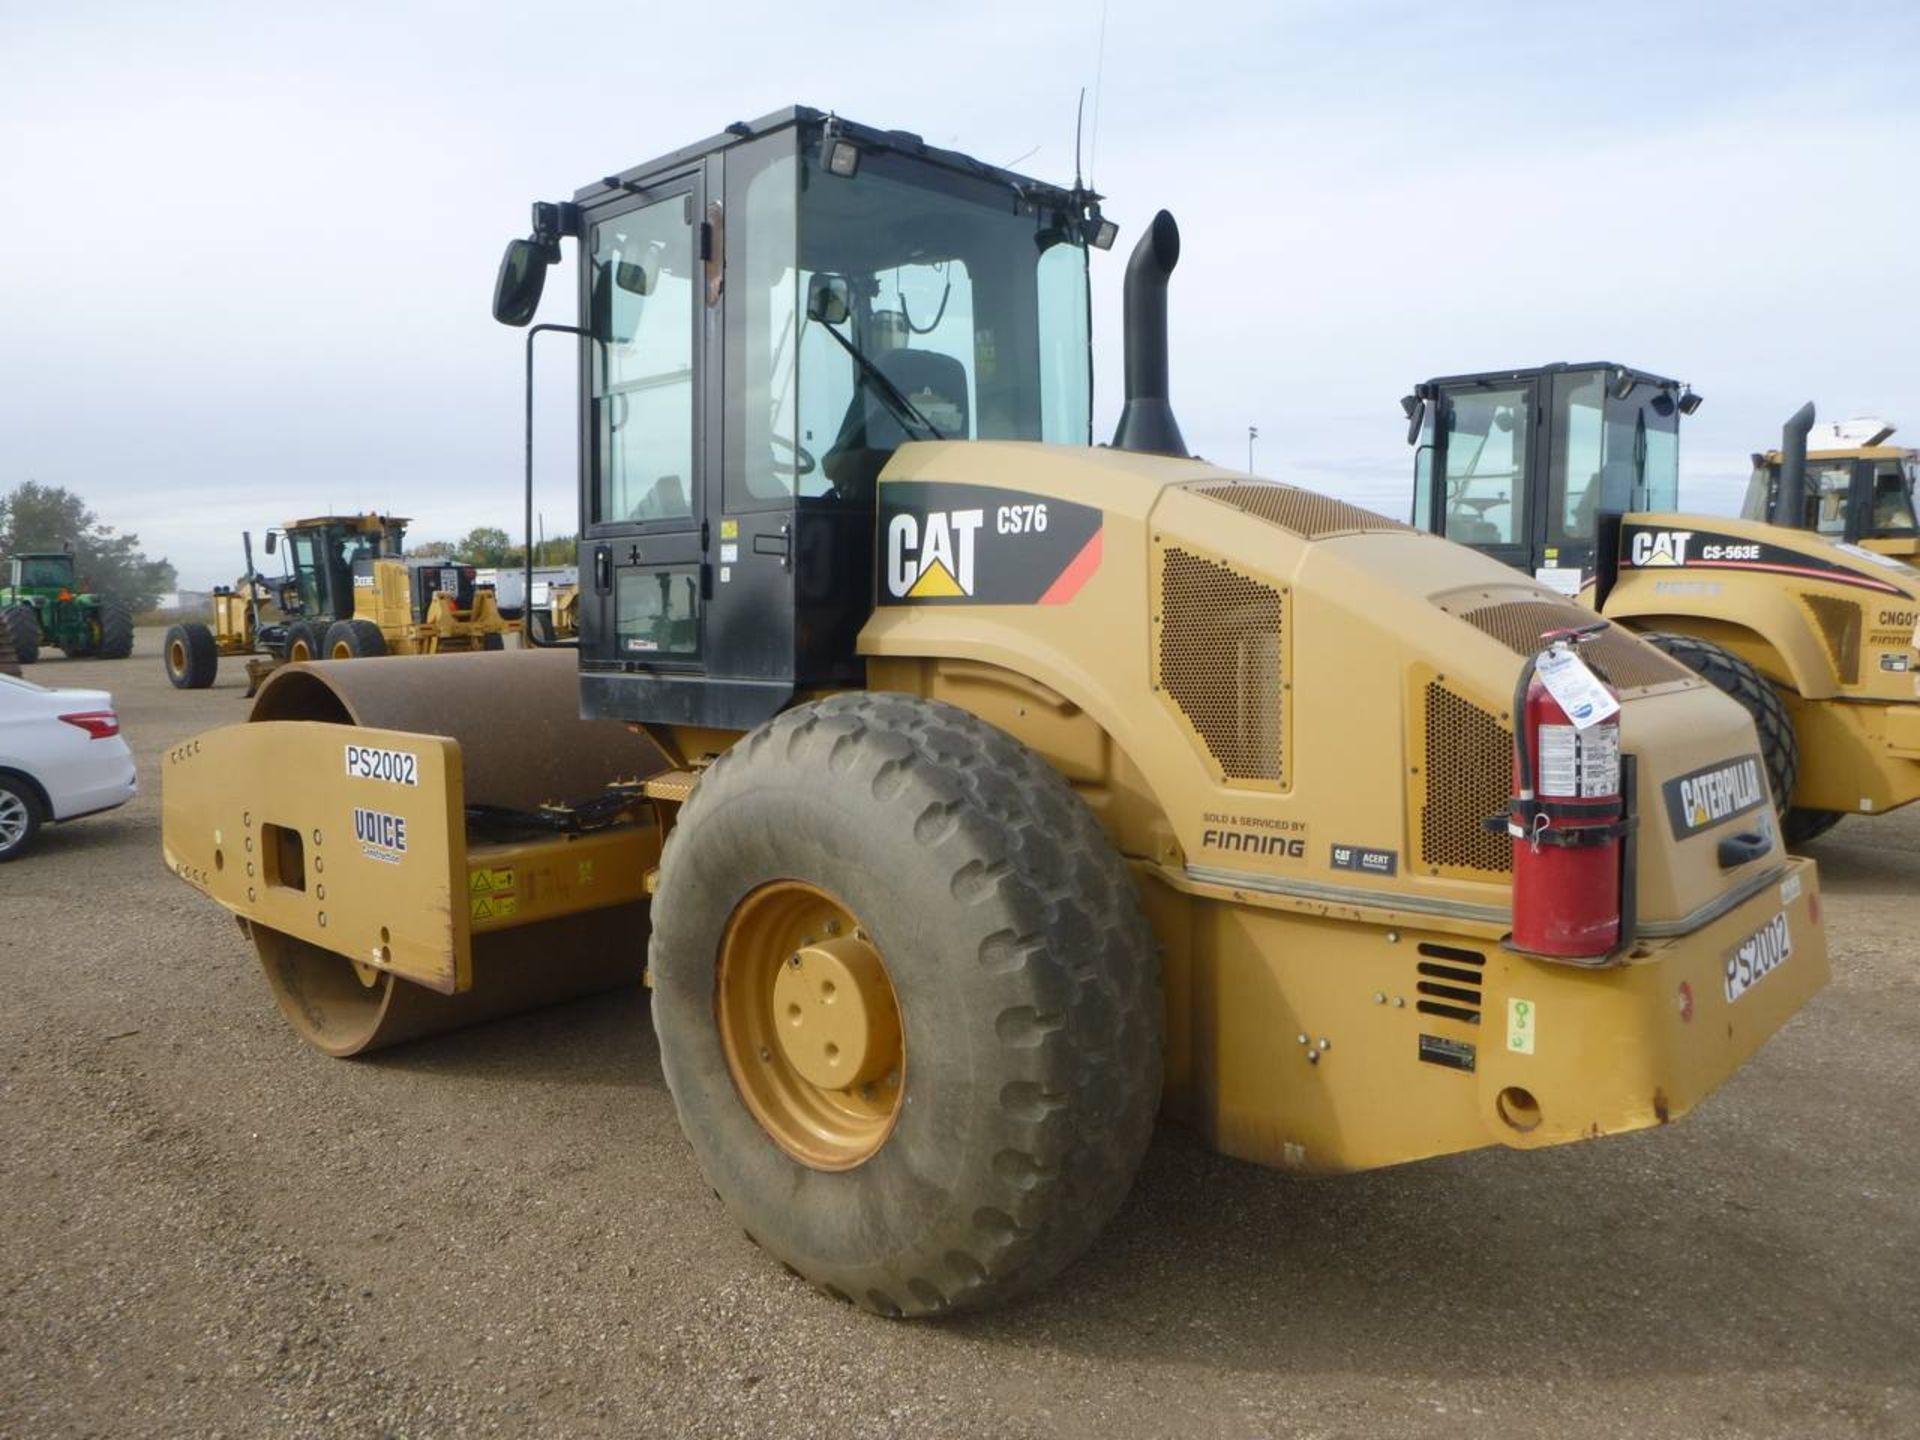 2011 Caterpillar CS76 Compactor - Image 4 of 9